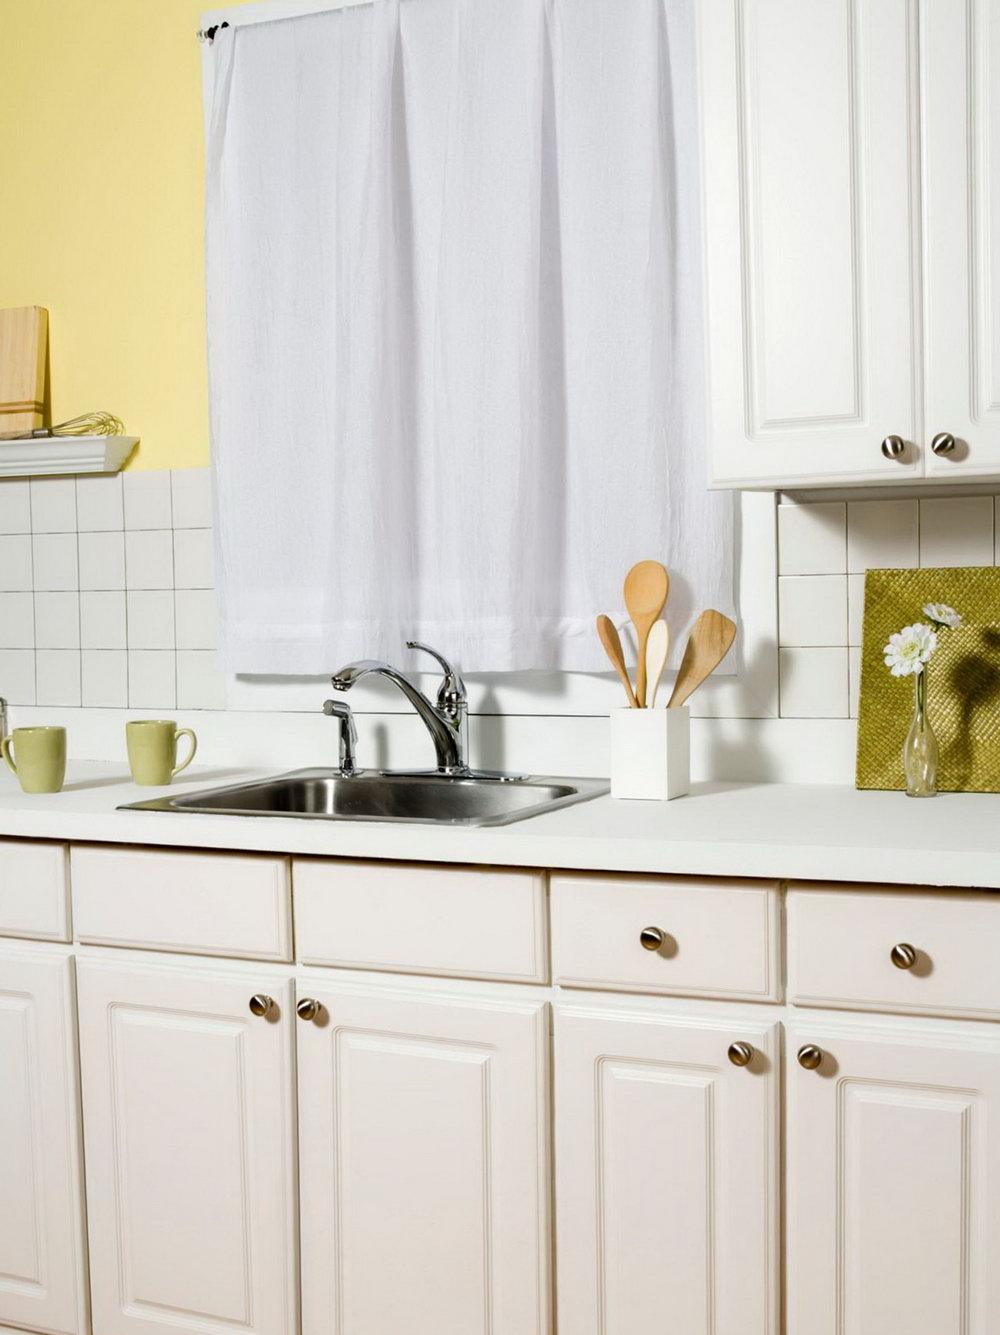 Kitchen Cabinet Feet B&q